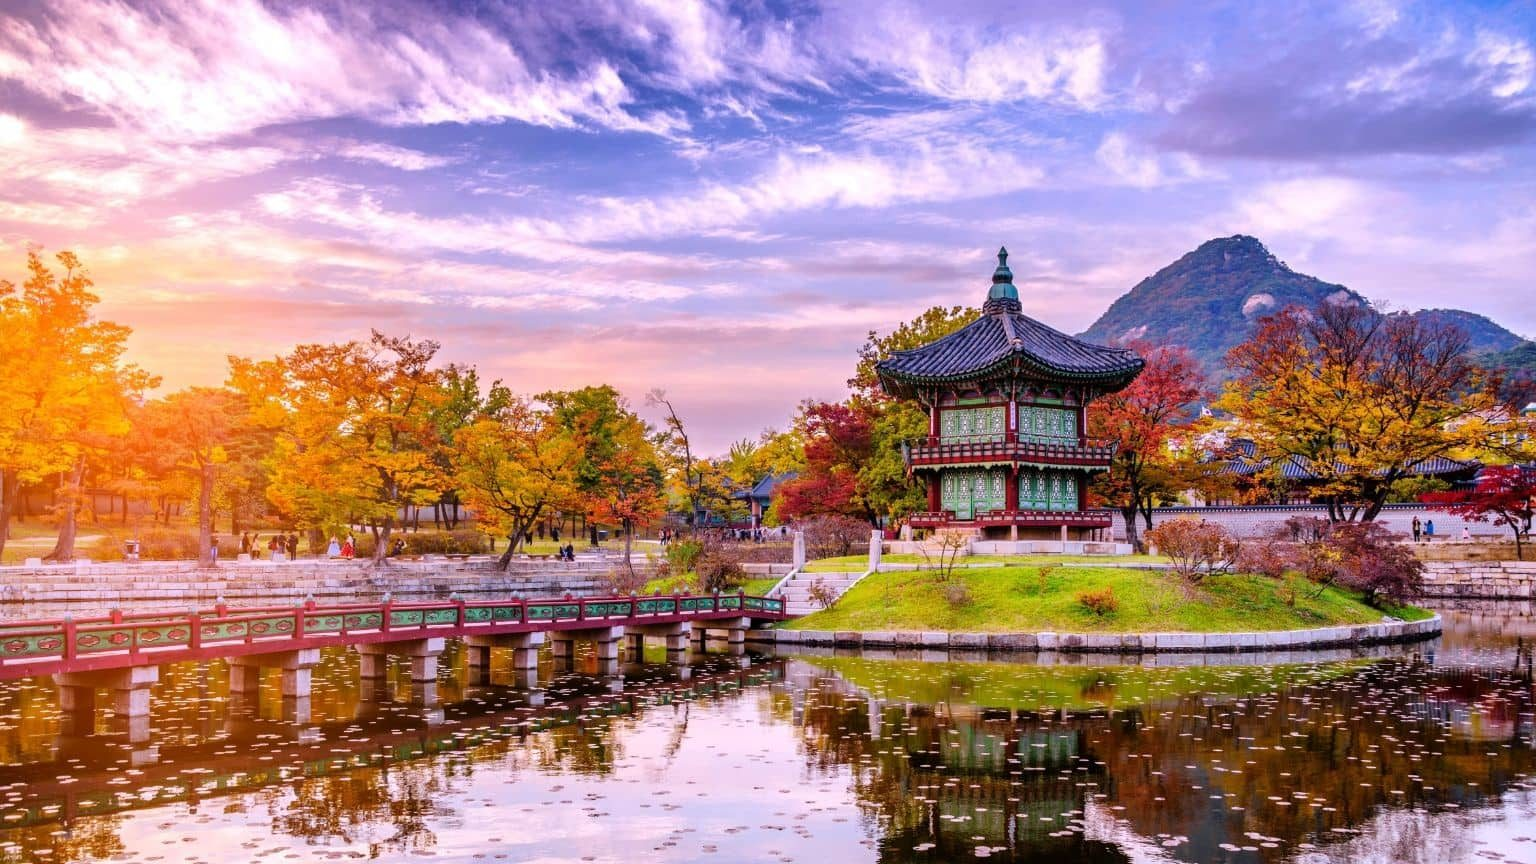 Sunset in water pavilion, Korea